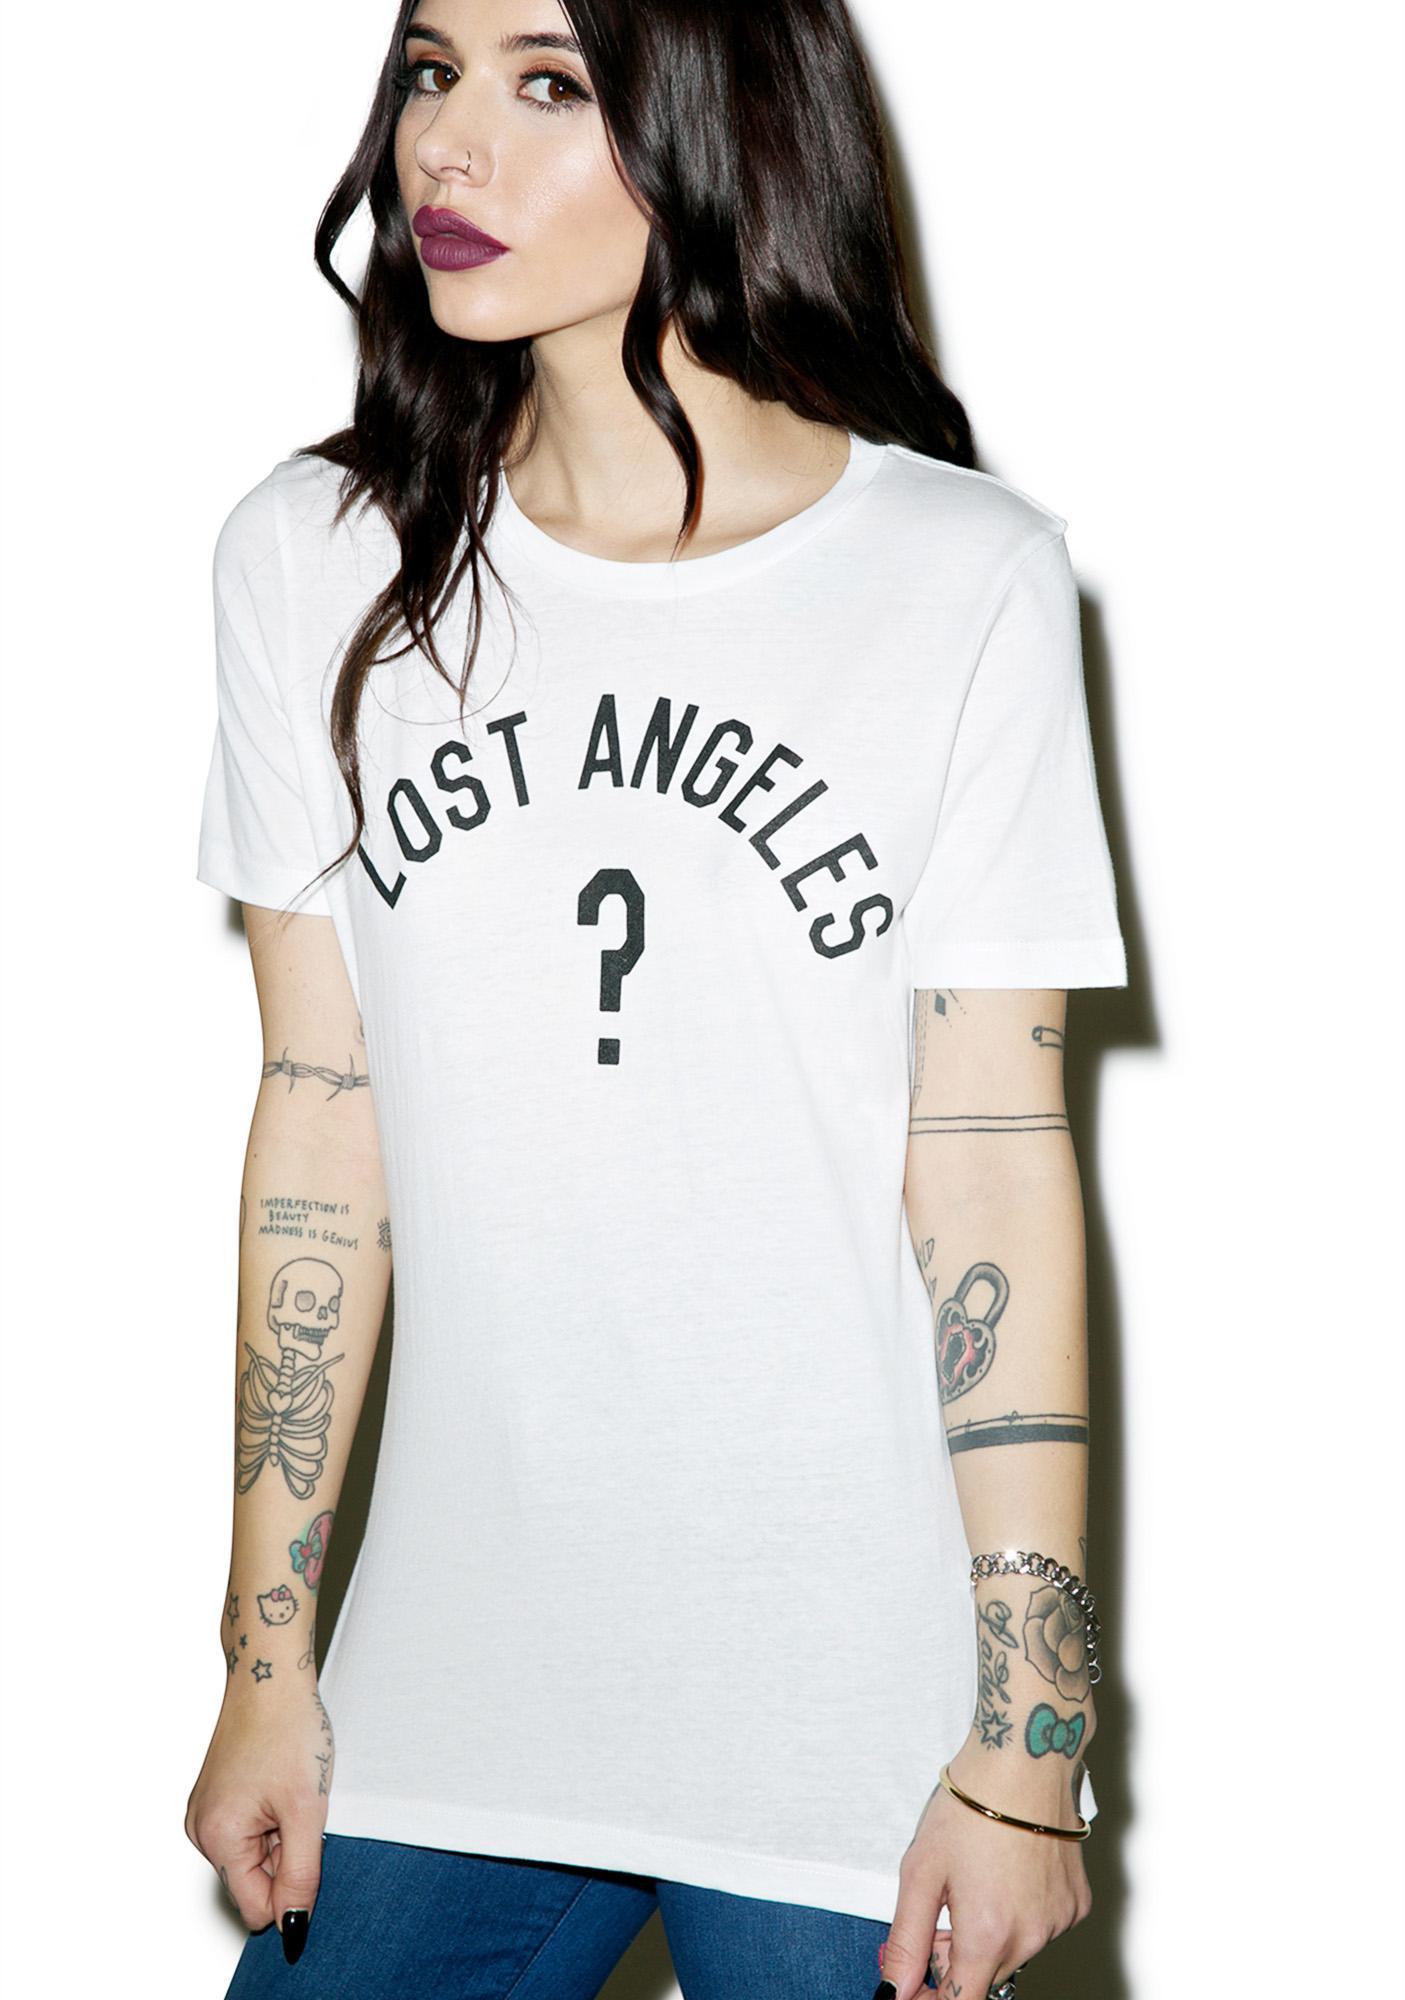 Lost Angeles Tee